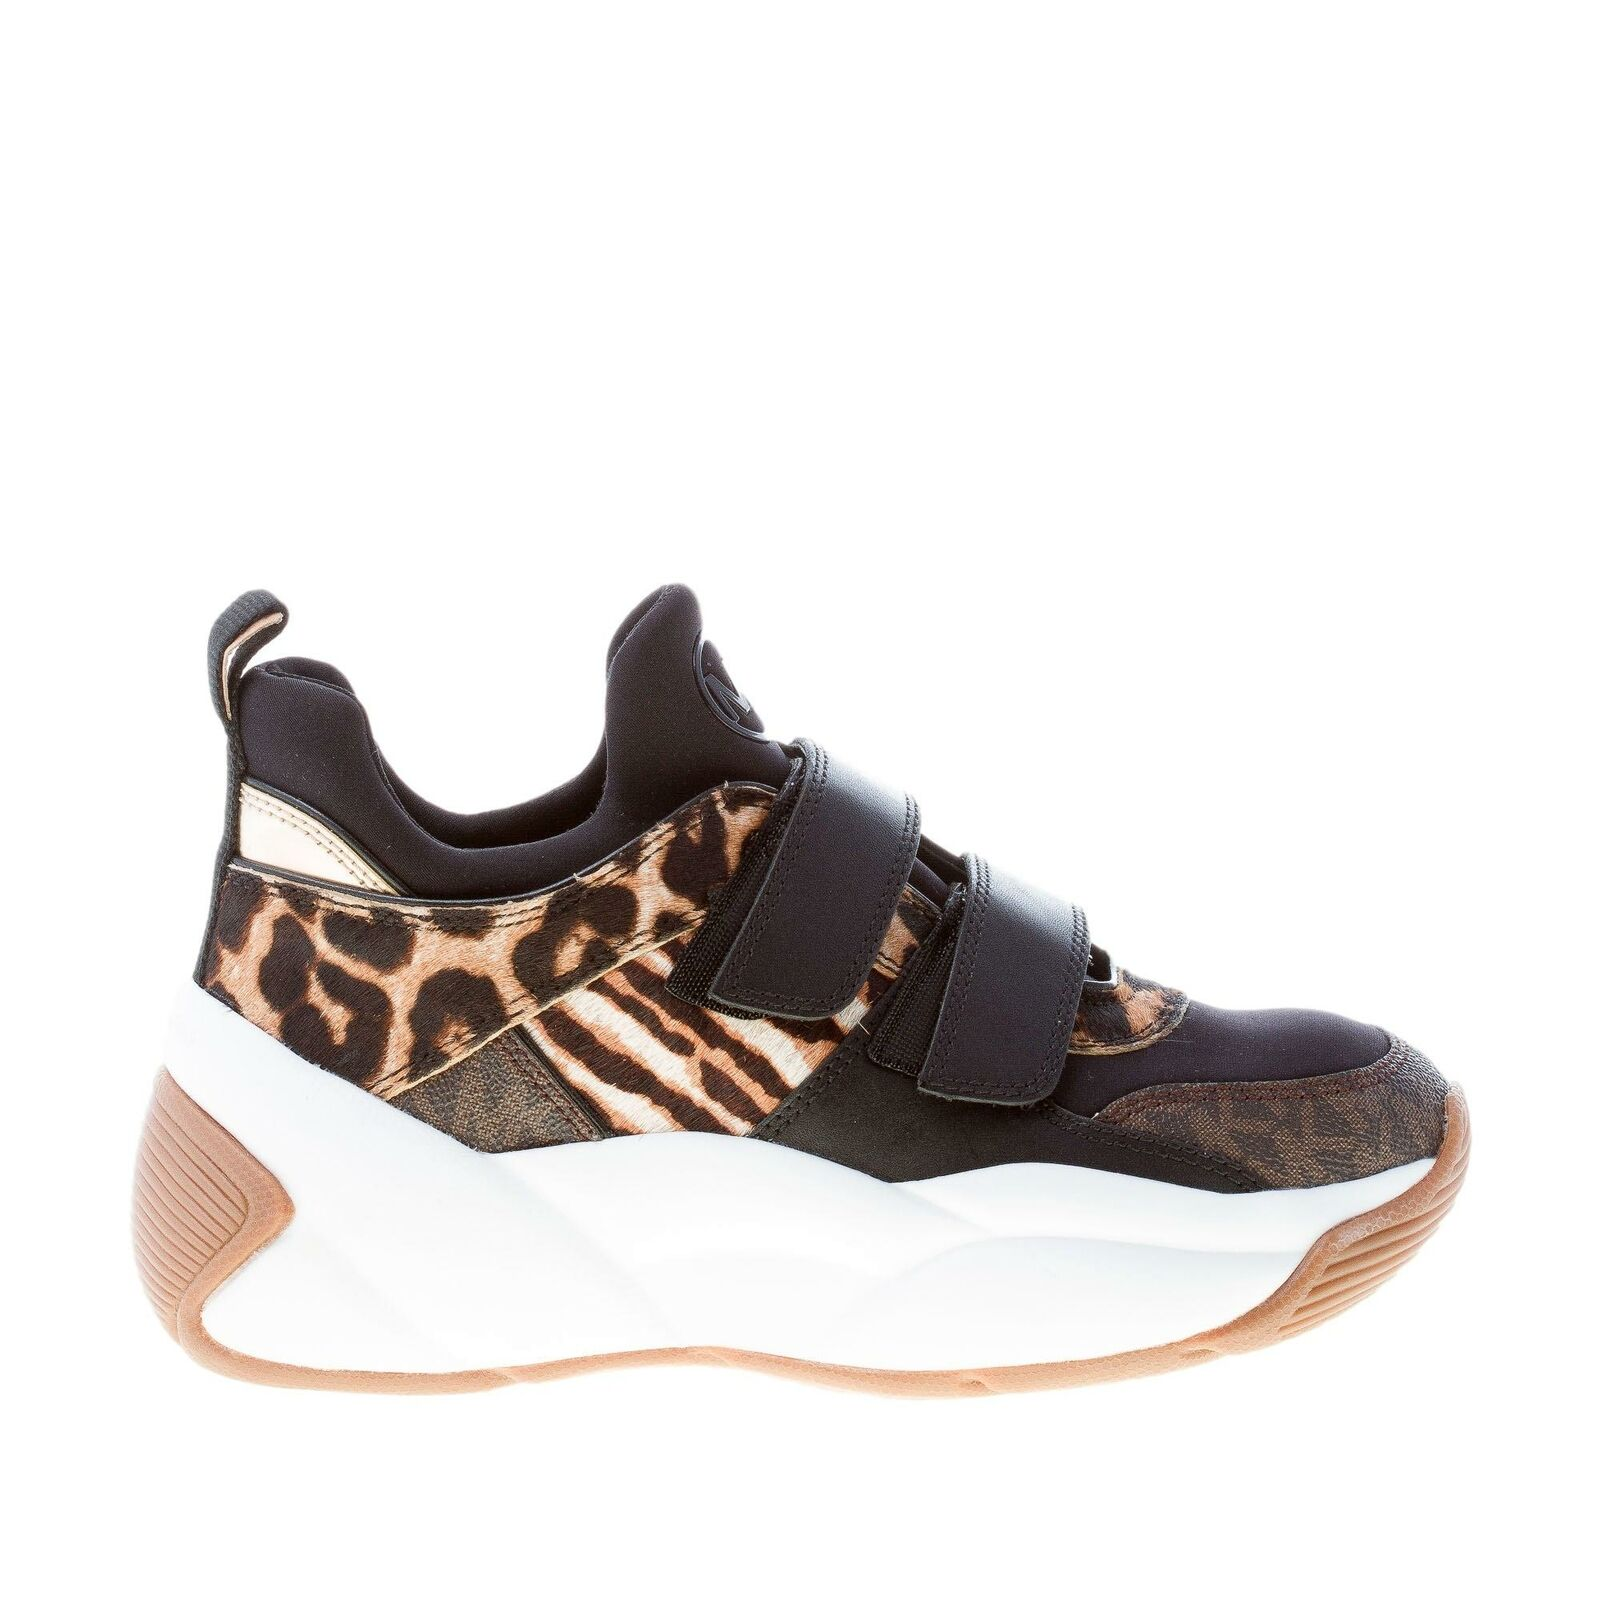 Michael Kors Womens Shoes Stanton